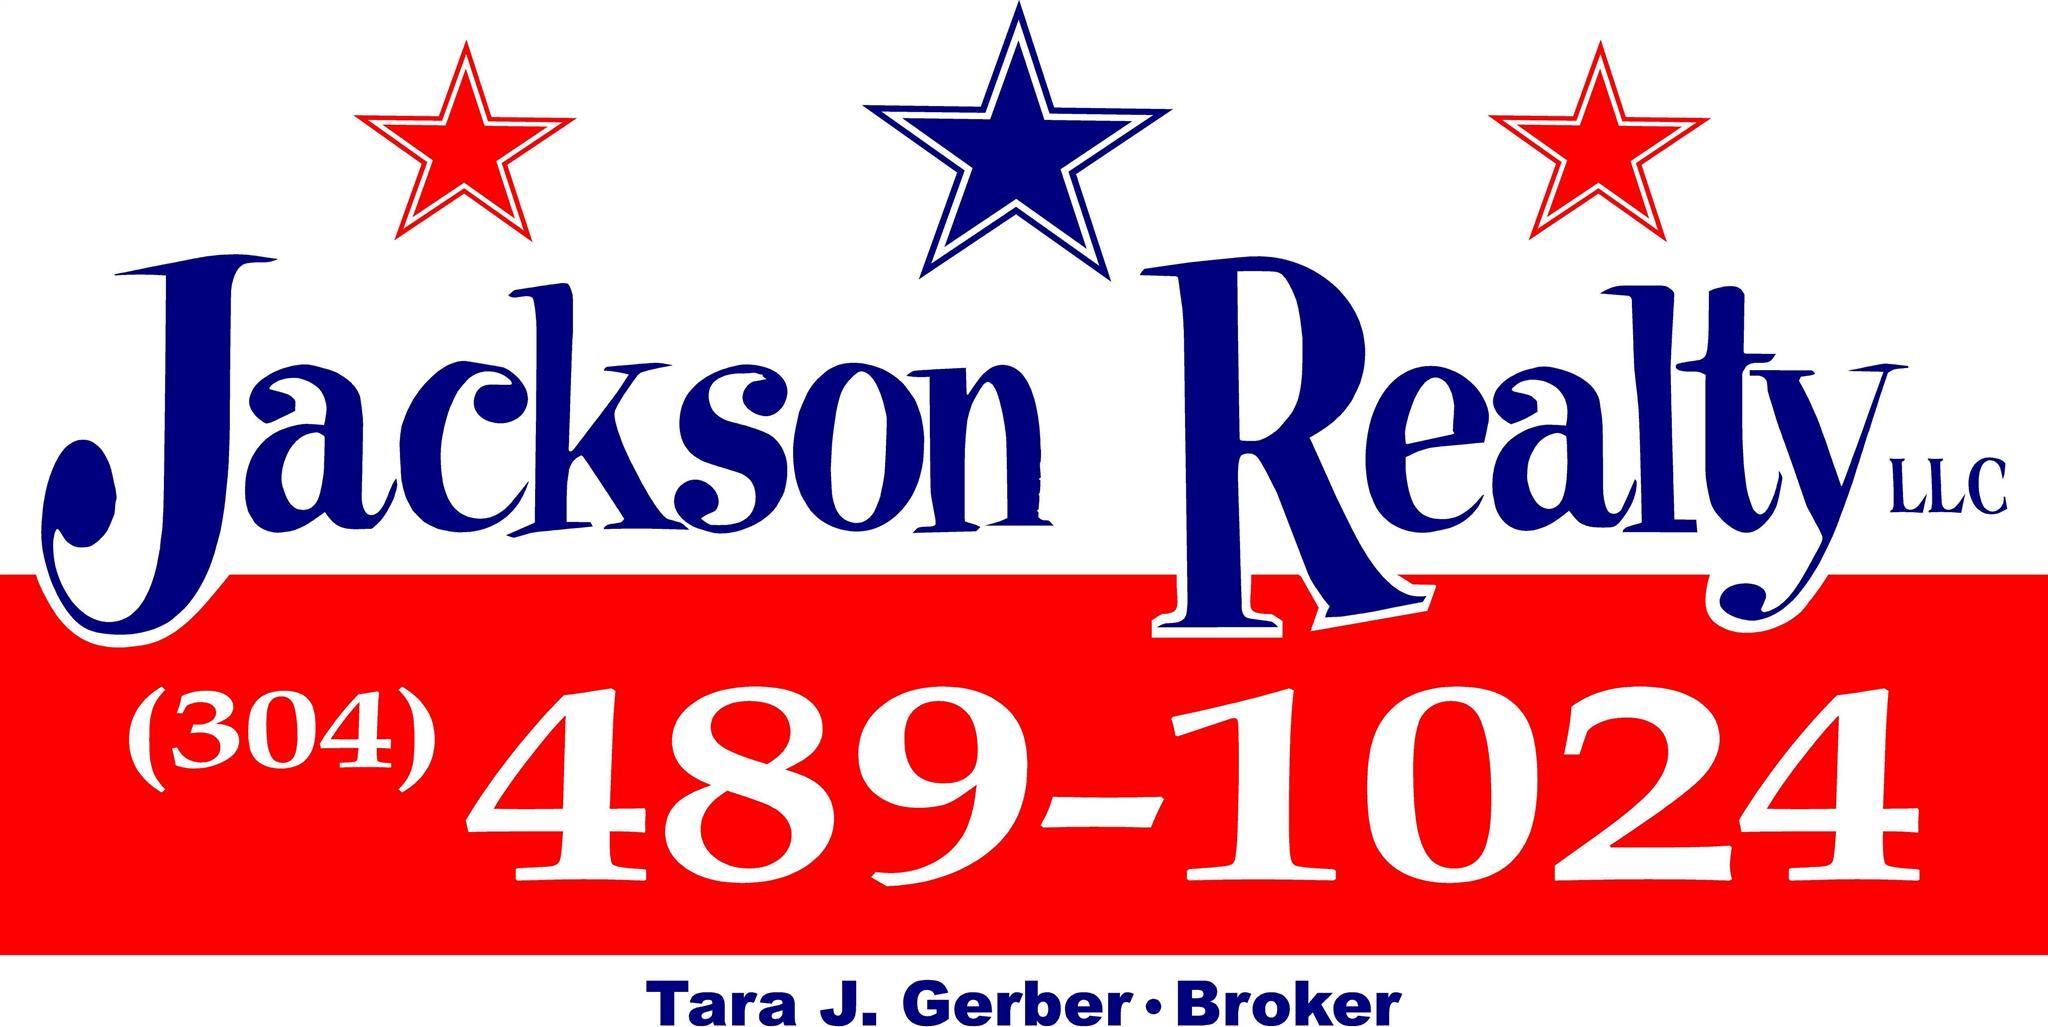 Jackson Realty, LLC